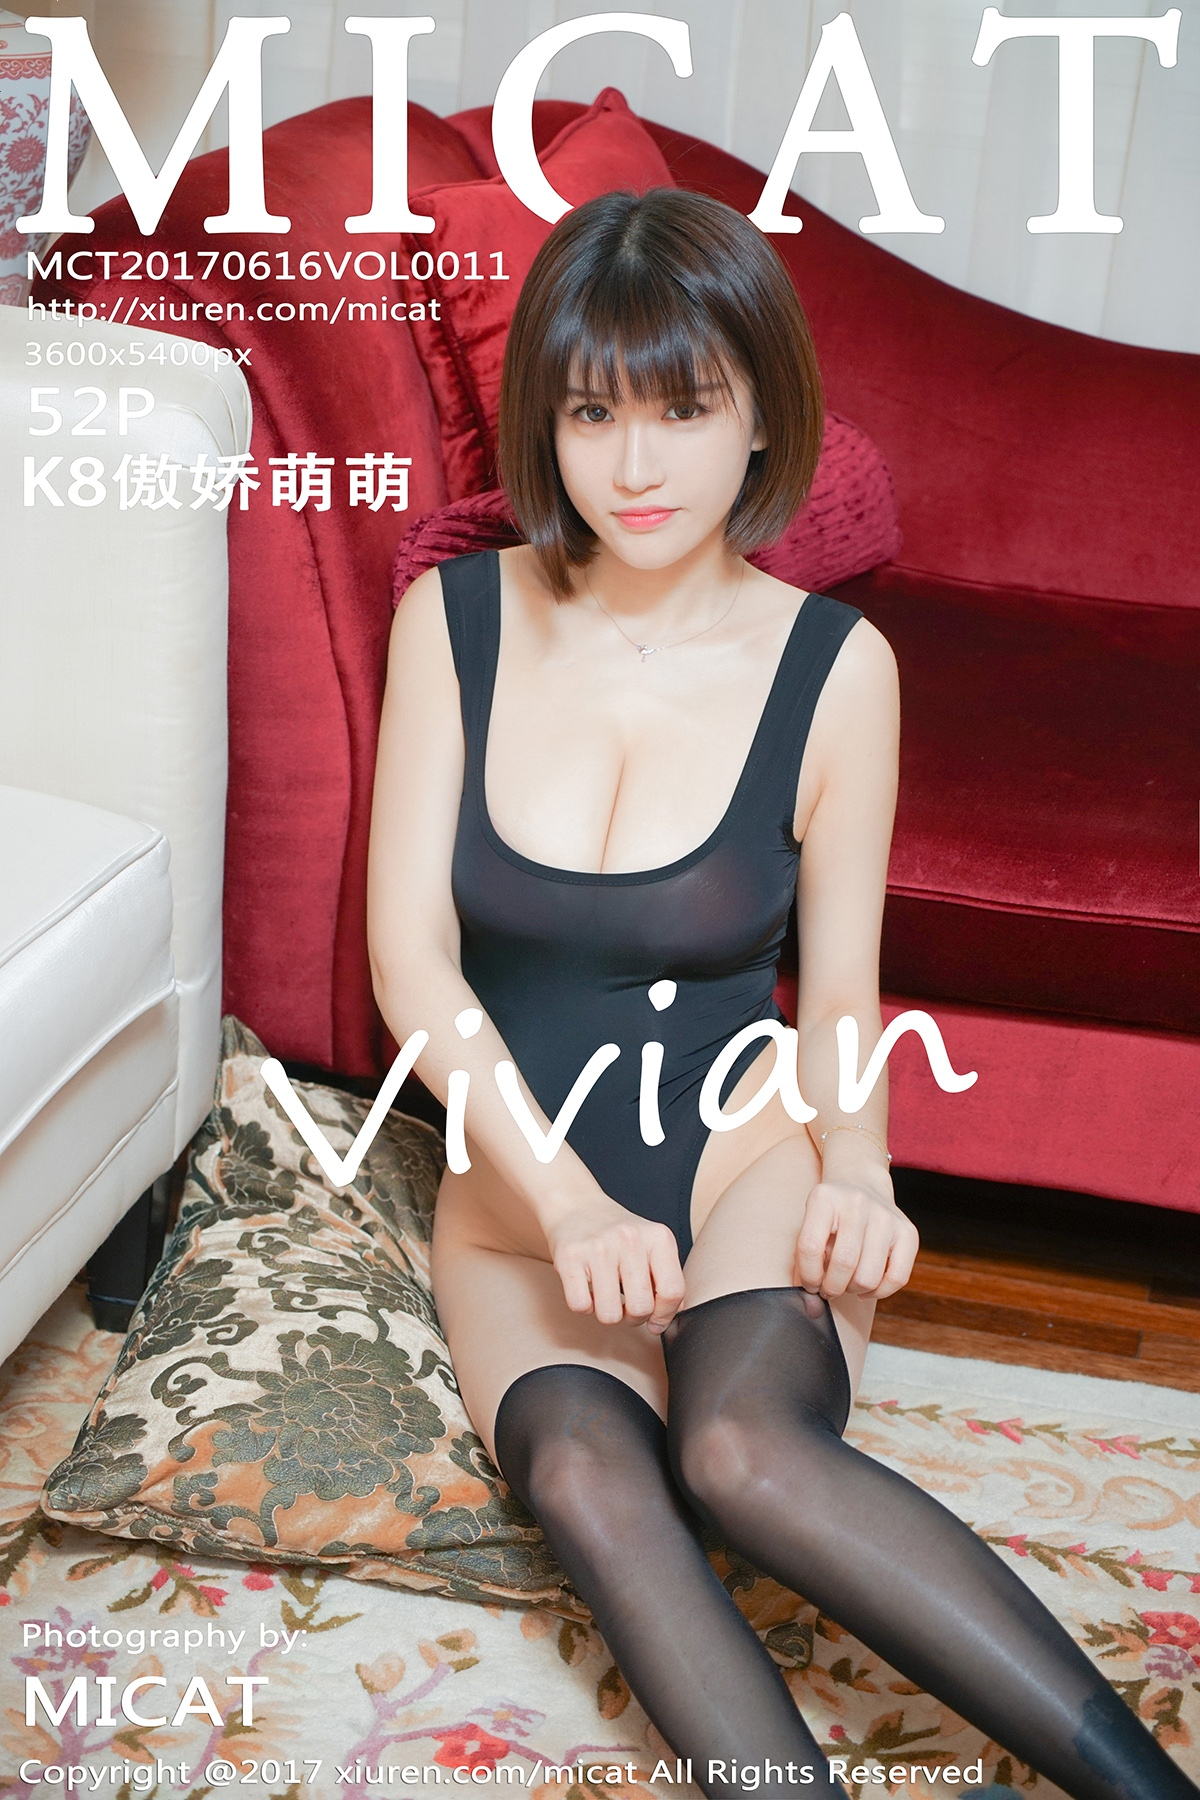 [MICAT猫萌榜]MCT20170616VOL0011 K8傲娇萌萌Vivian 童颜巨乳 连体内衣与丝袜美腿私房写真集